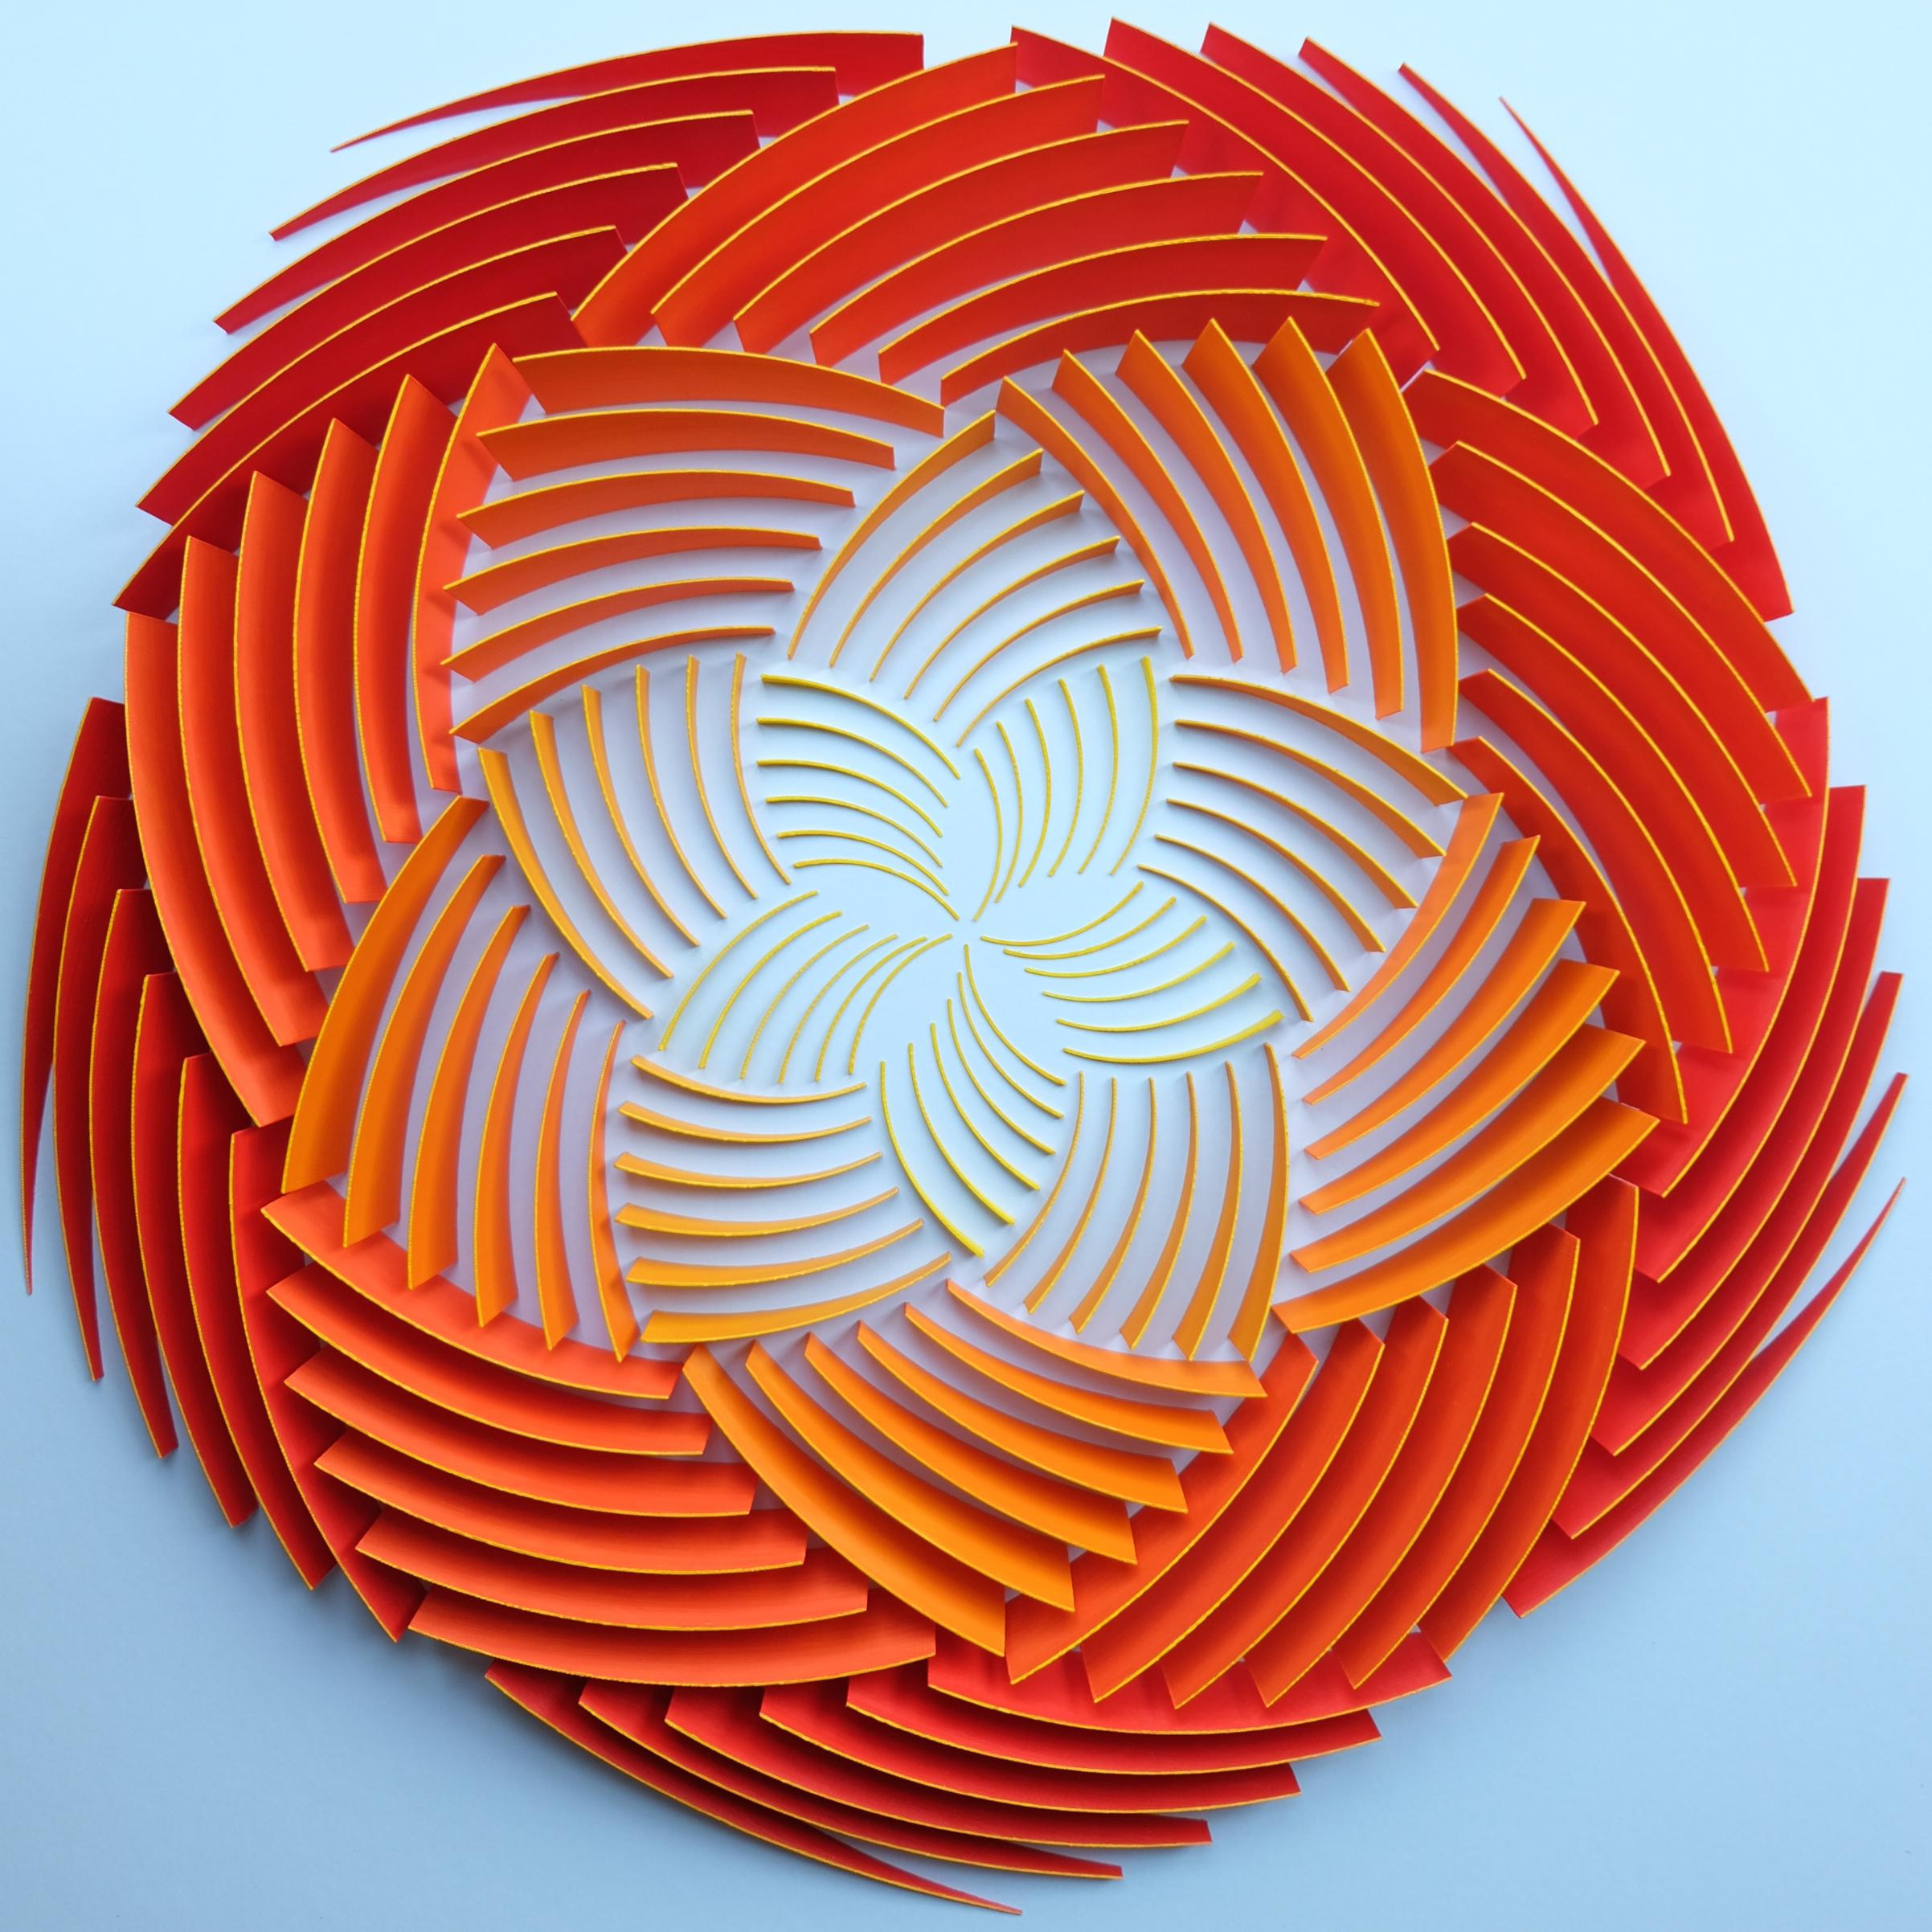 SpiralWeave1.JPG